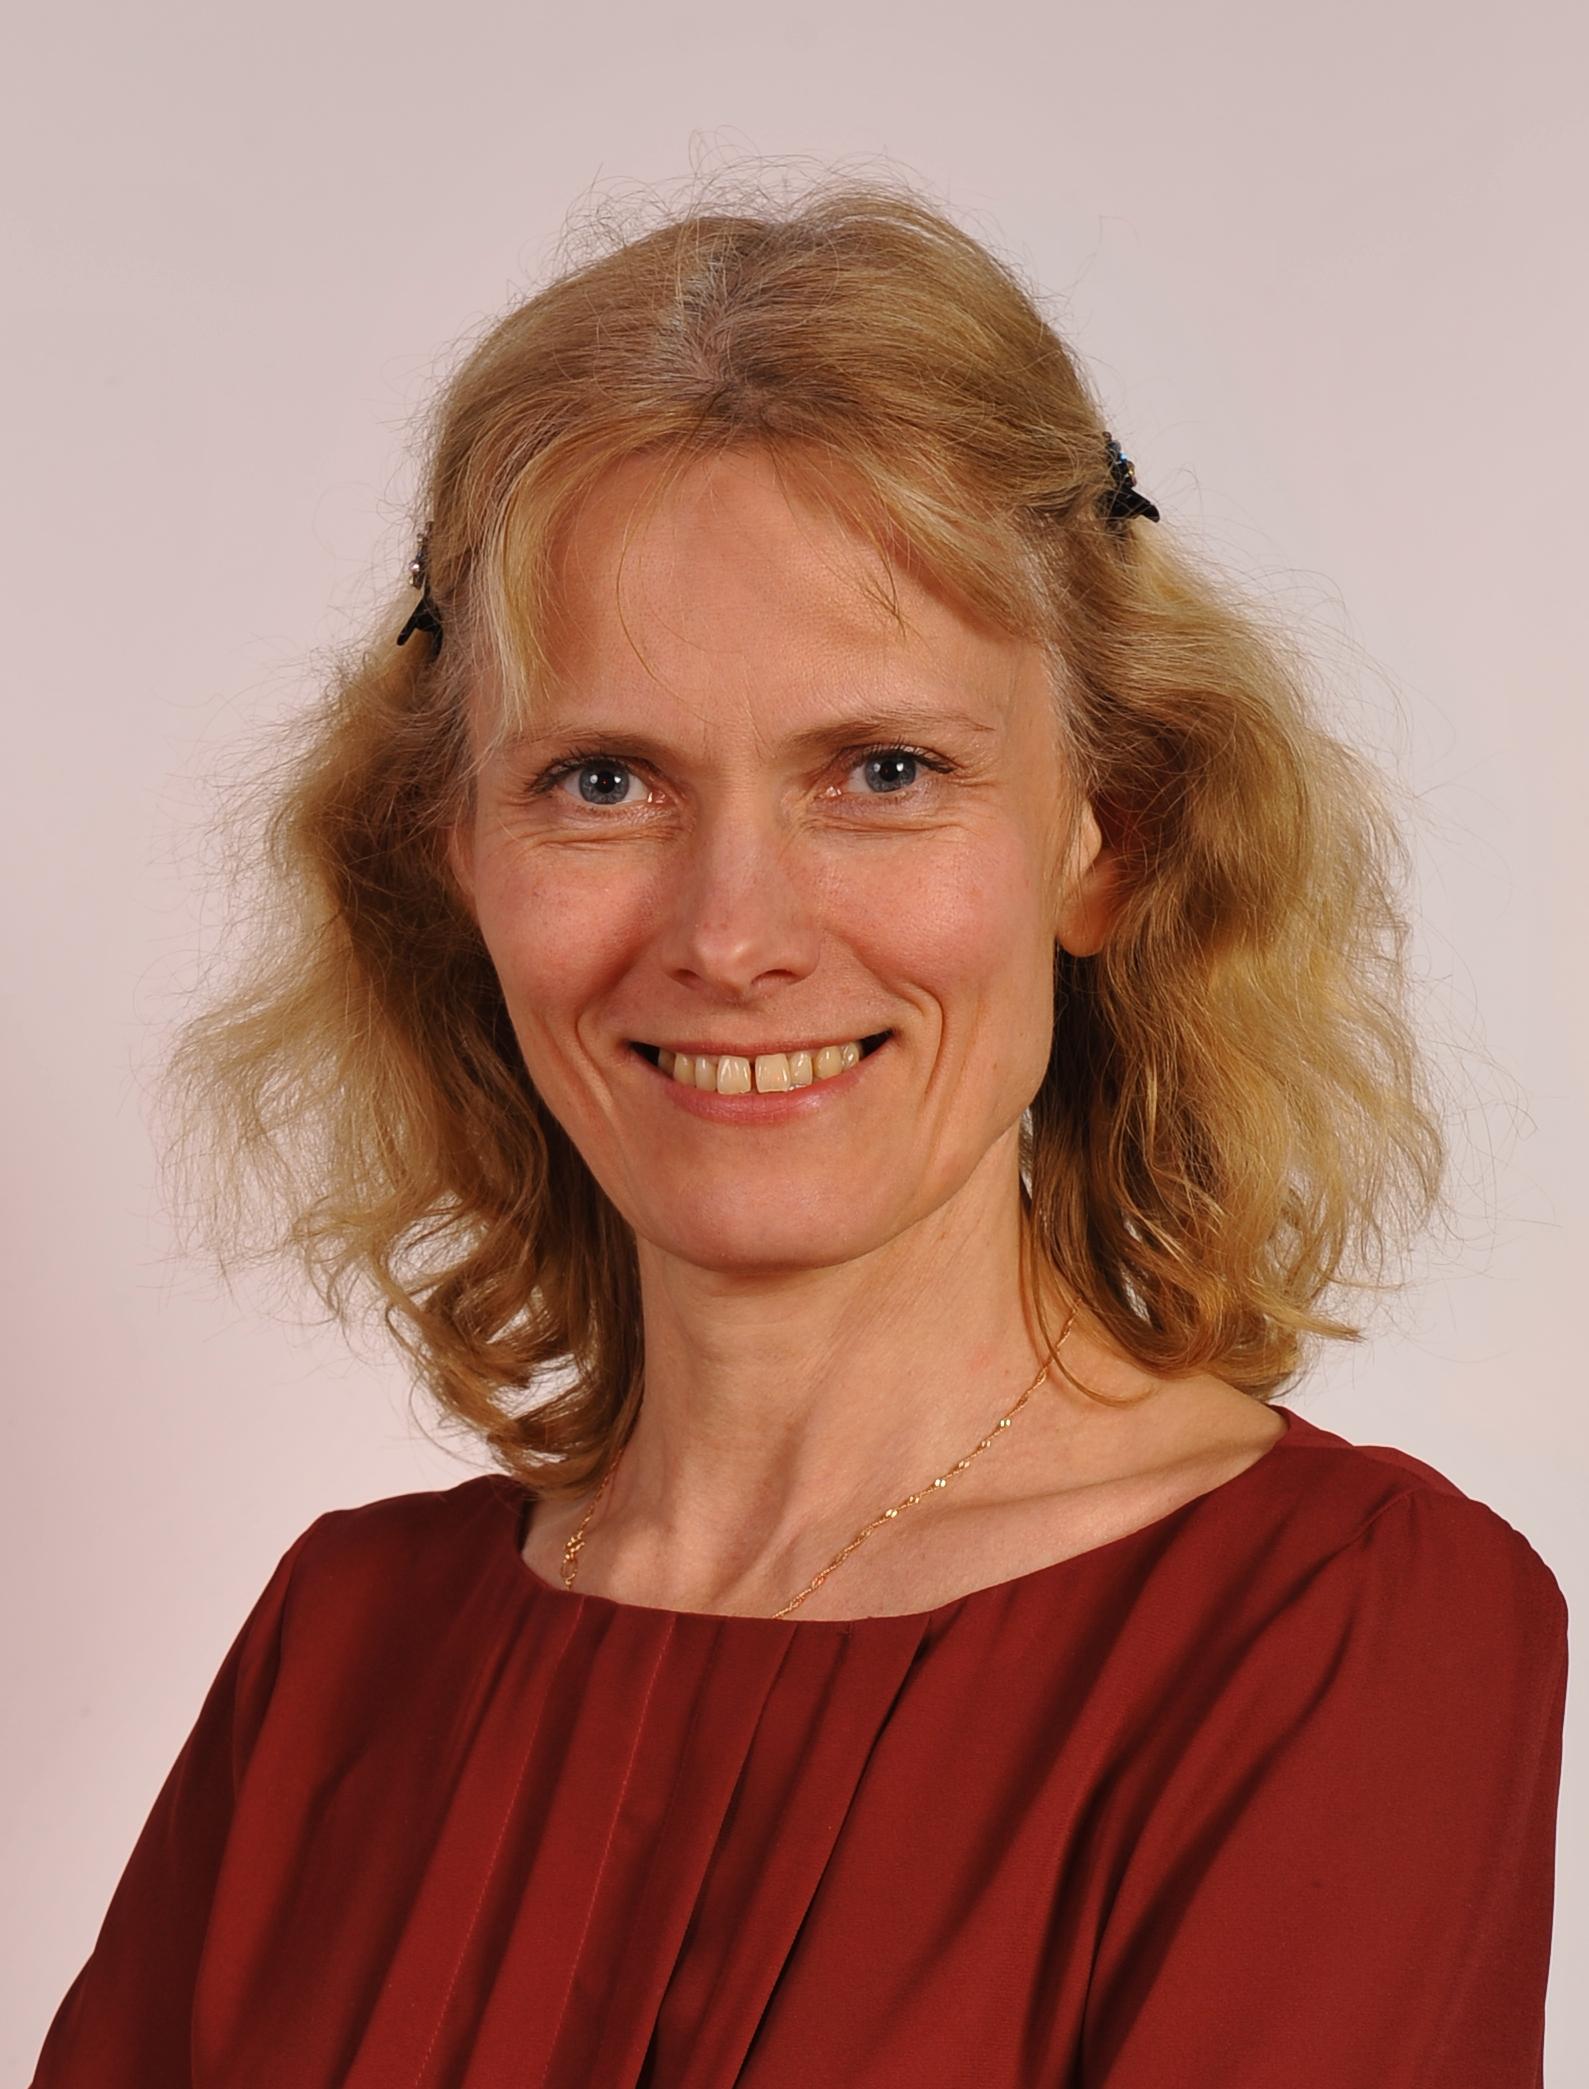 Уедагог-организатор, учитель музыкиСухарева Ирина Климовна